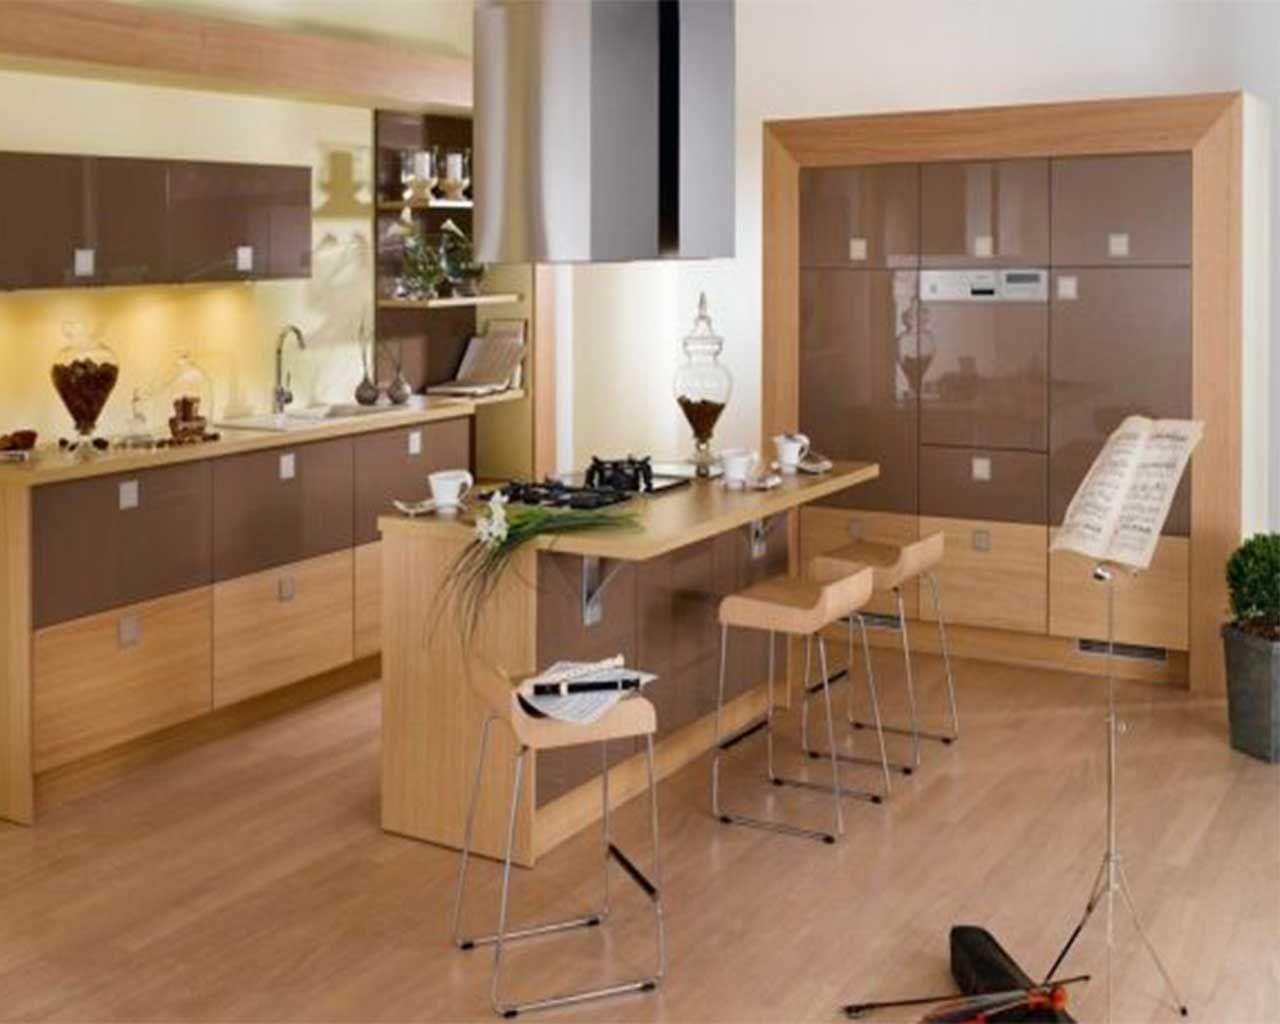 latest kitchen ideas new kitchen ideas at home design and. best